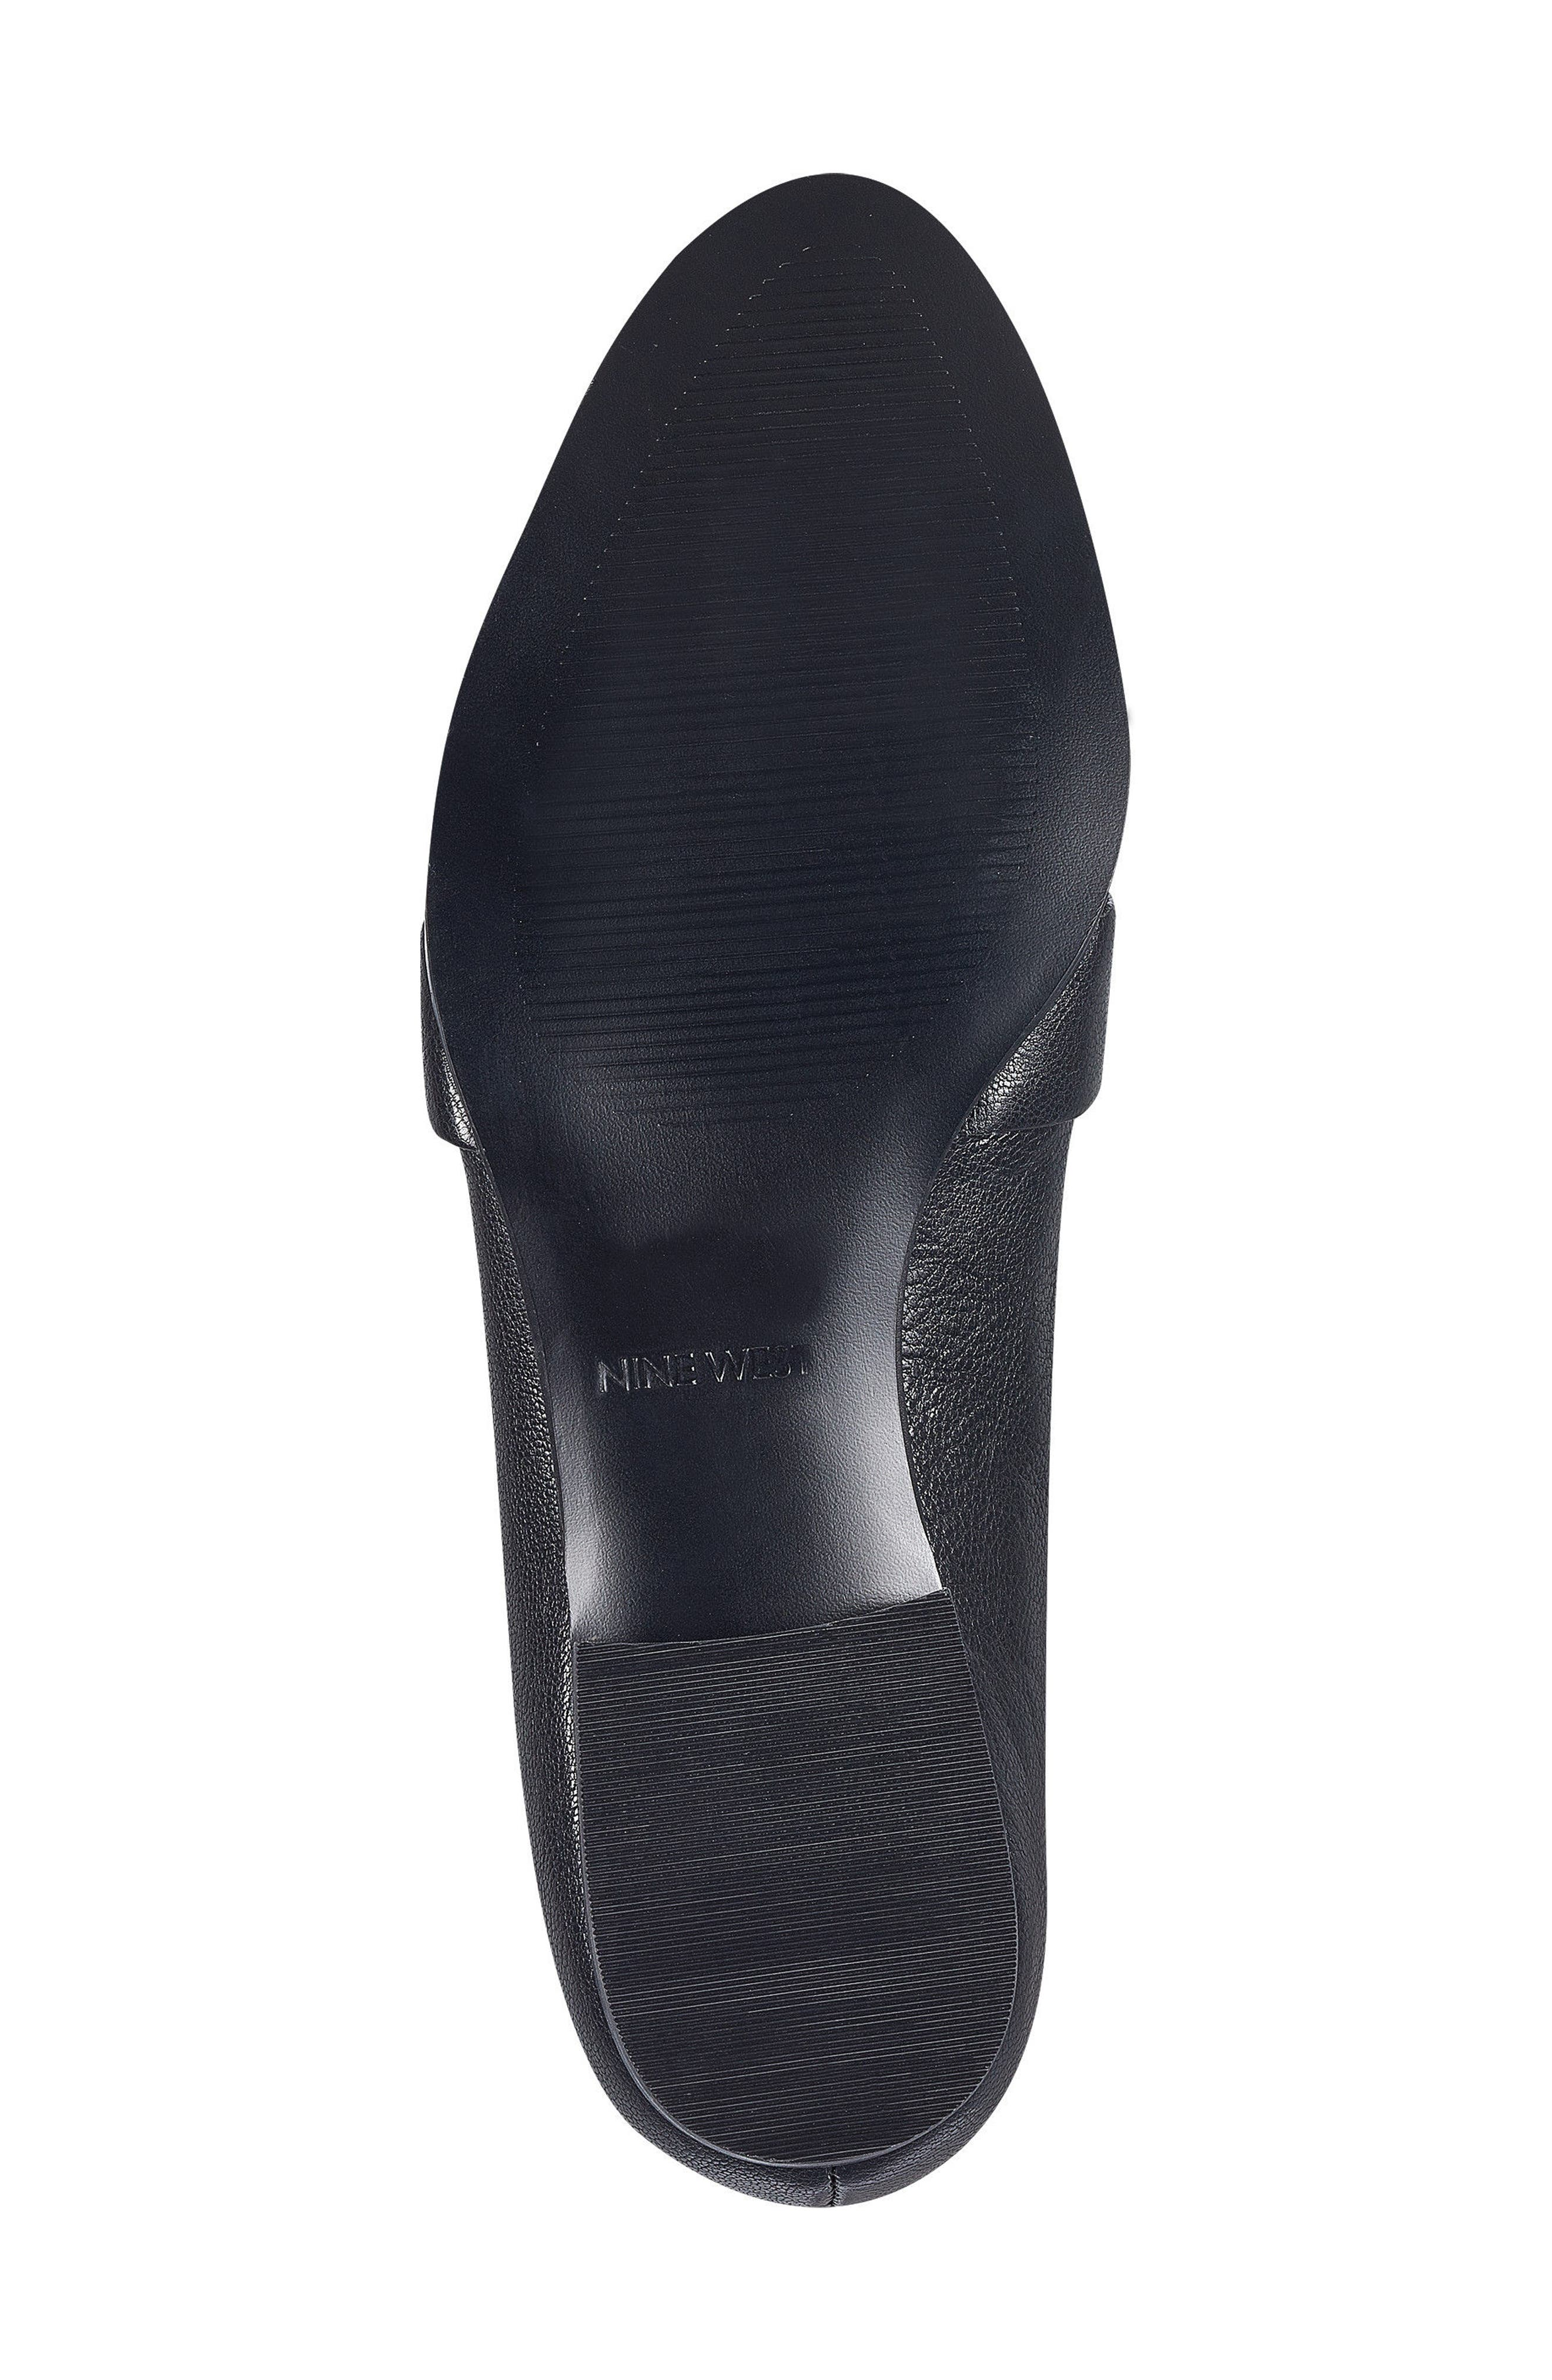 Huff Loafer Flat,                             Alternate thumbnail 6, color,                             Black Leather